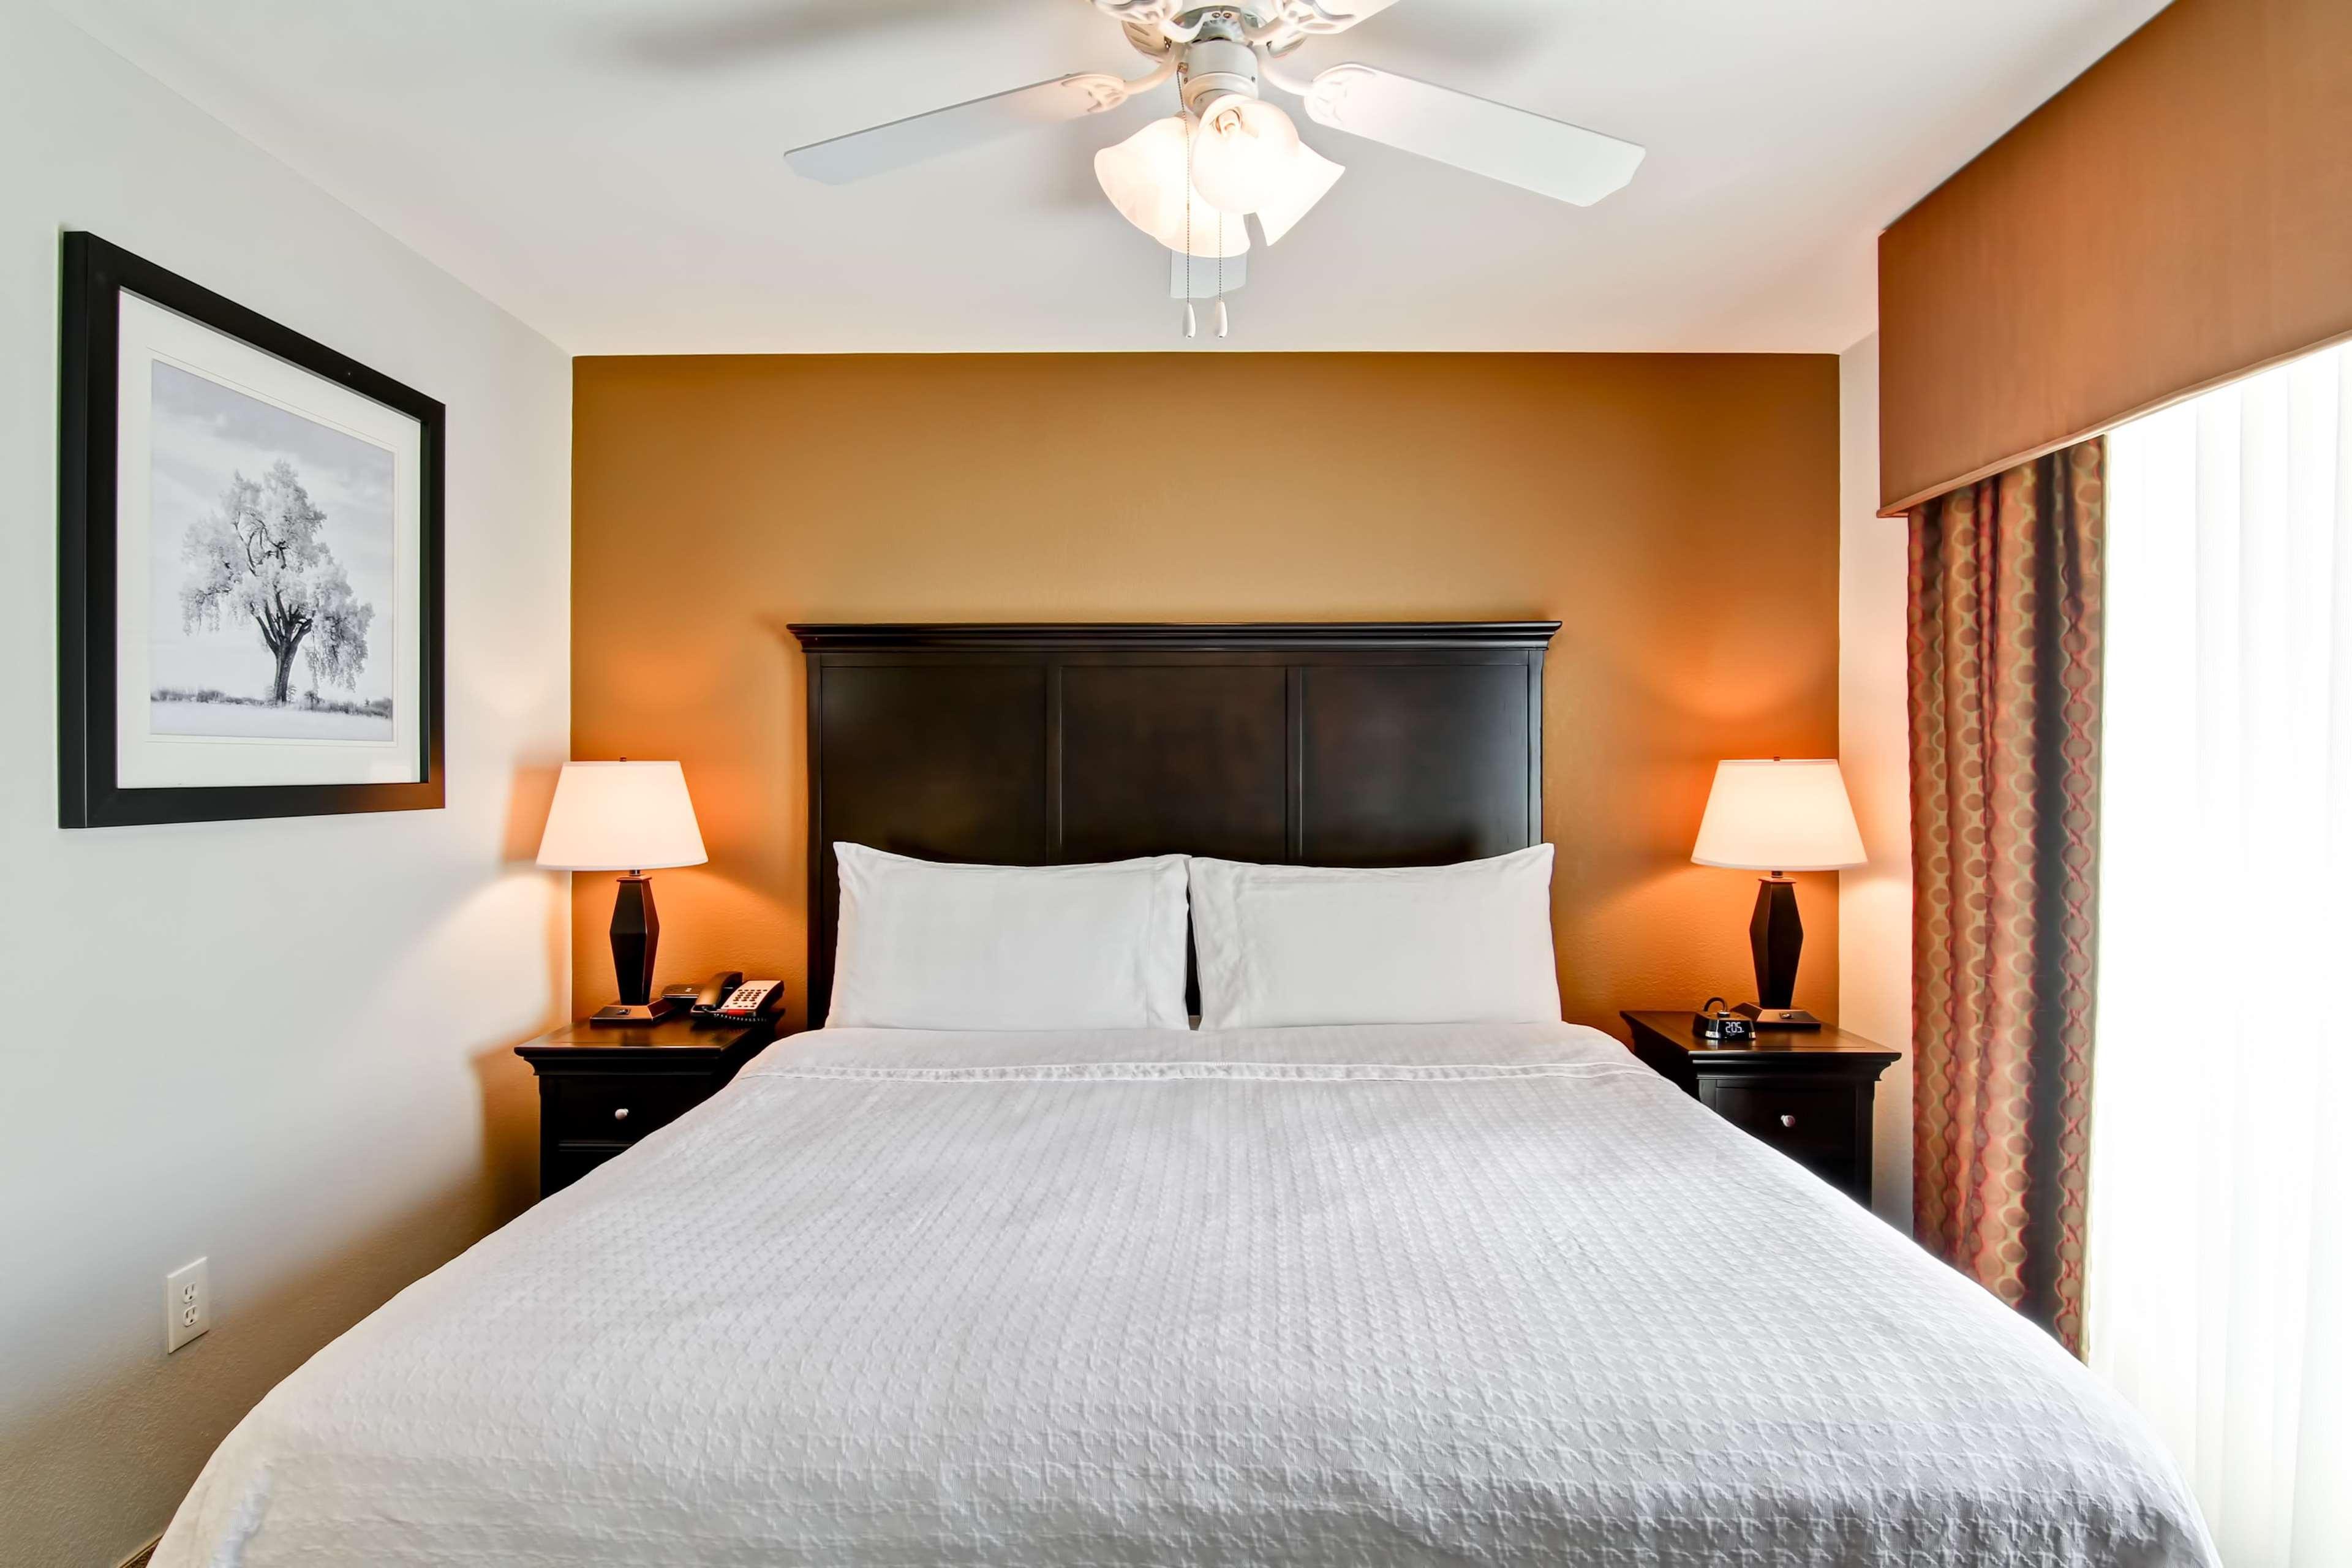 Homewood Suites by Hilton Cincinnati Airport South-Florence image 36